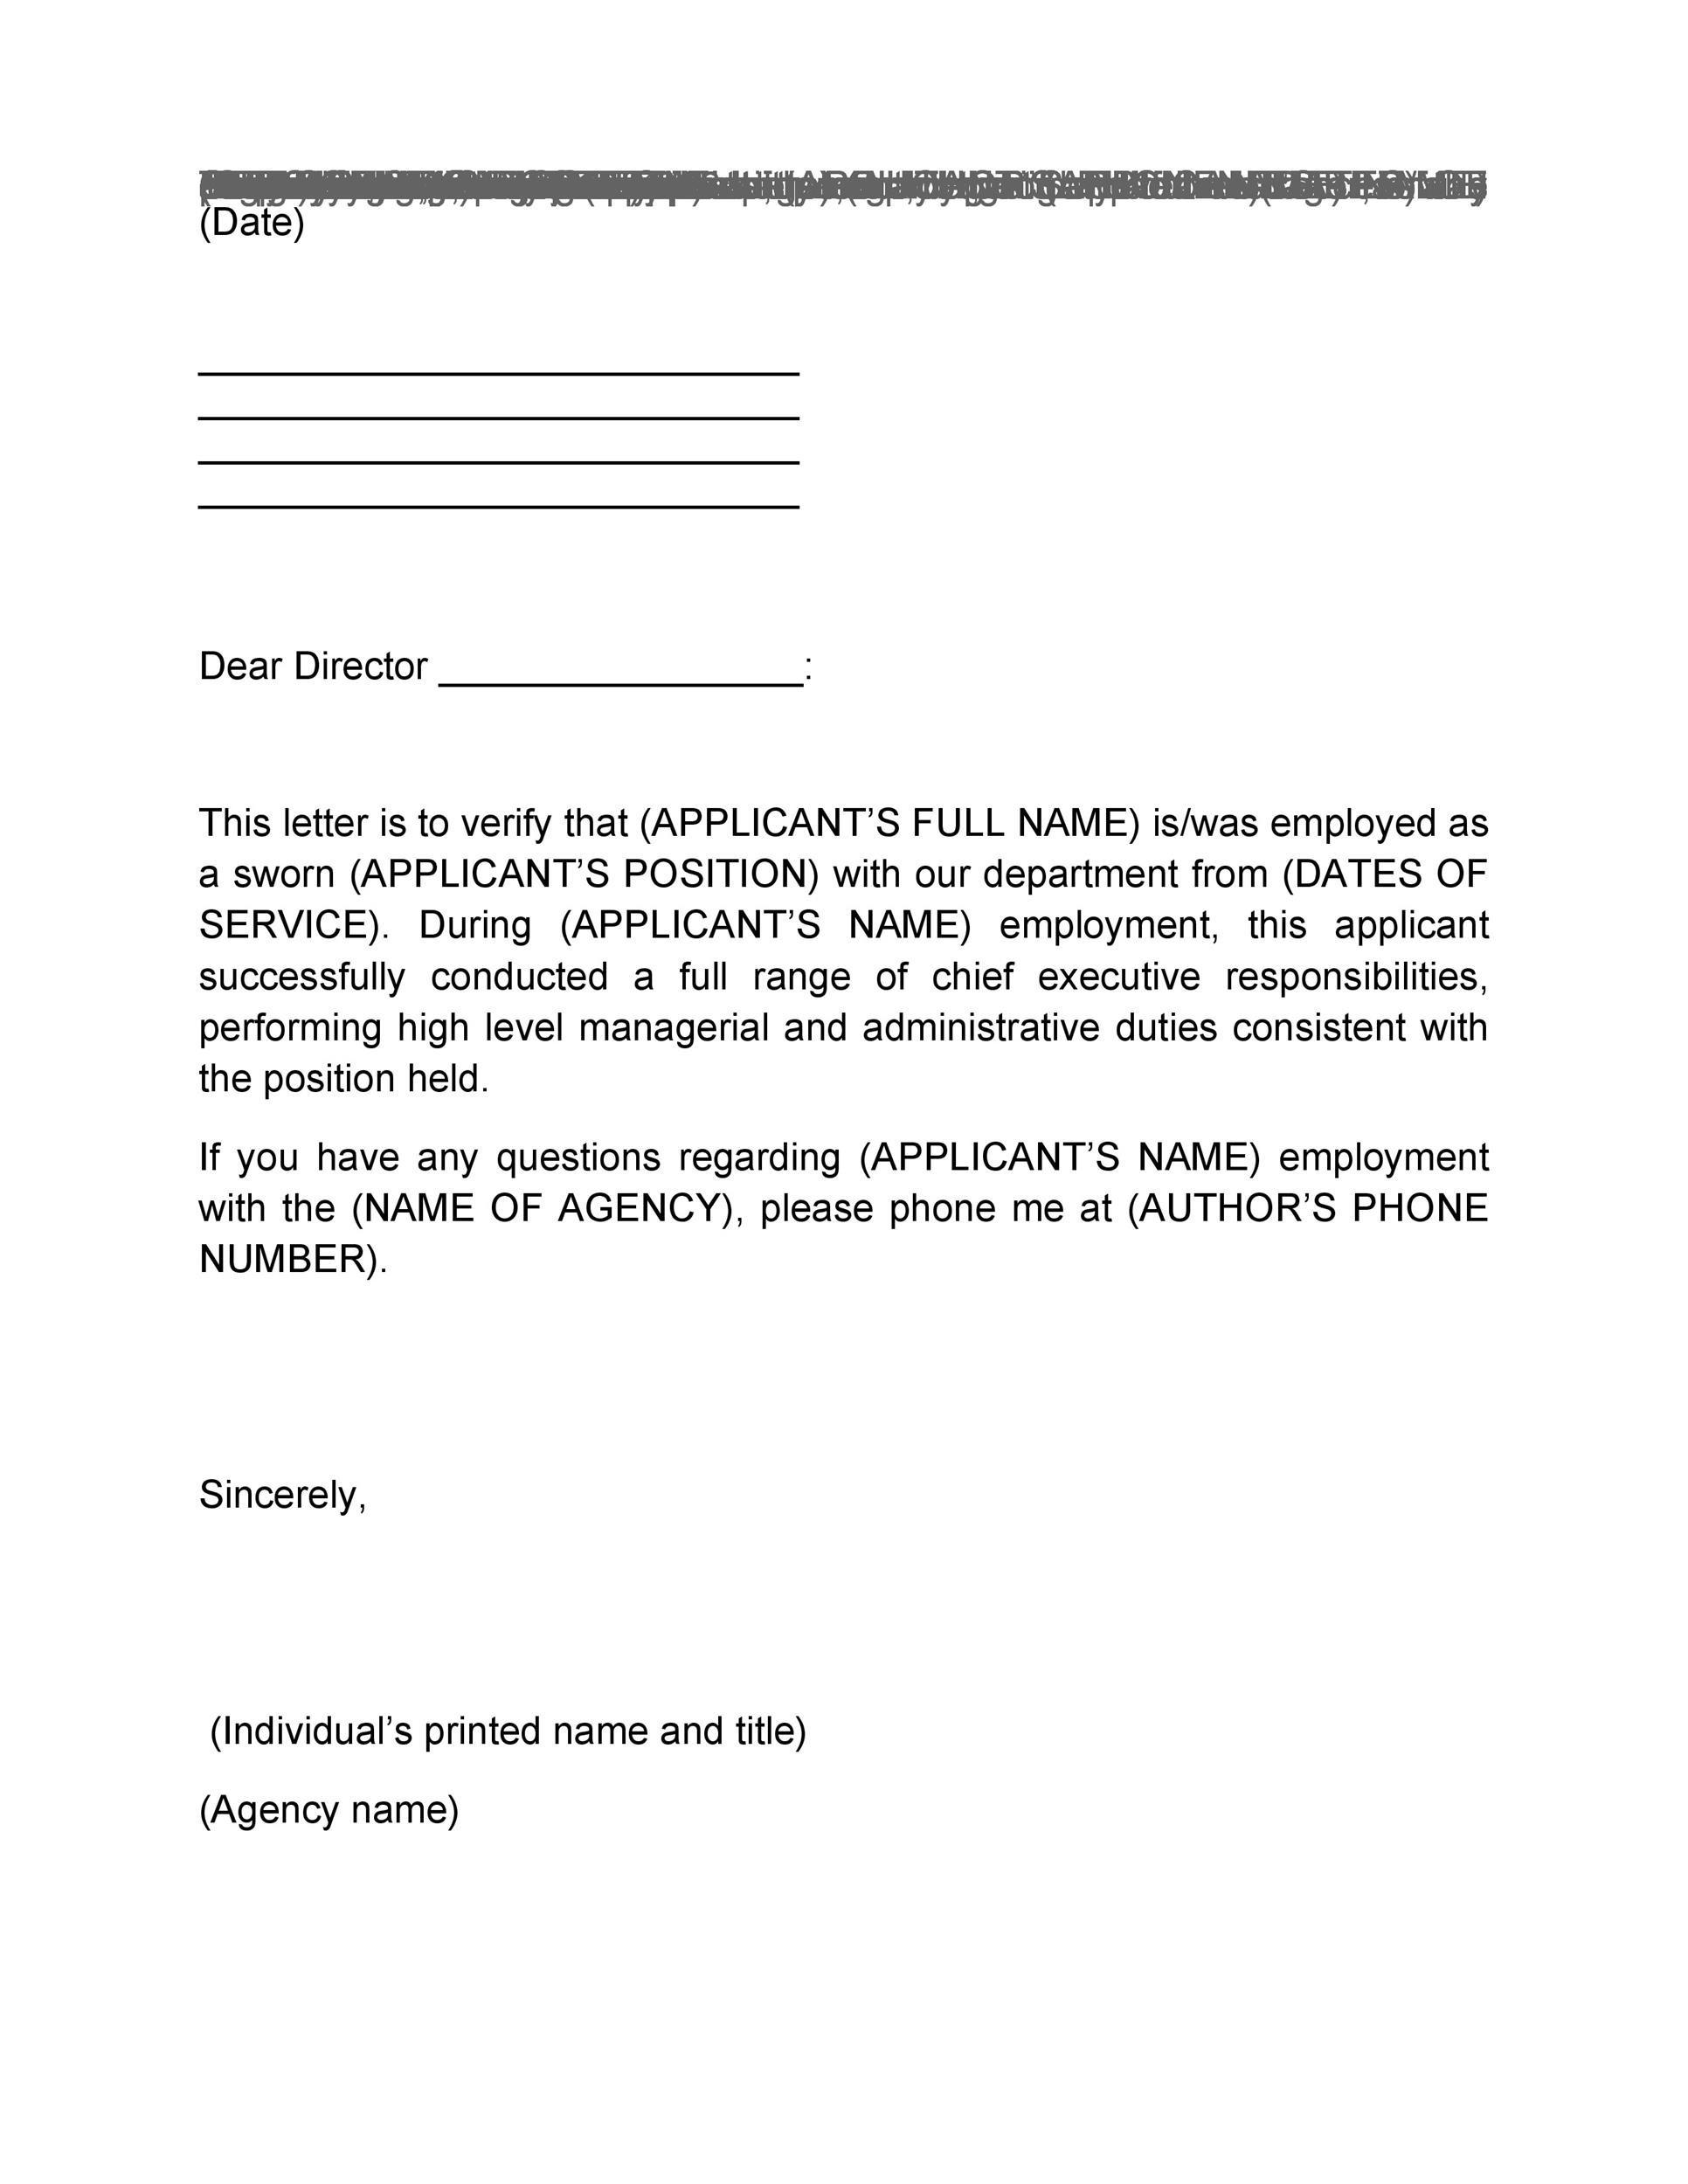 varification letter - Cypru.hamsaa.co